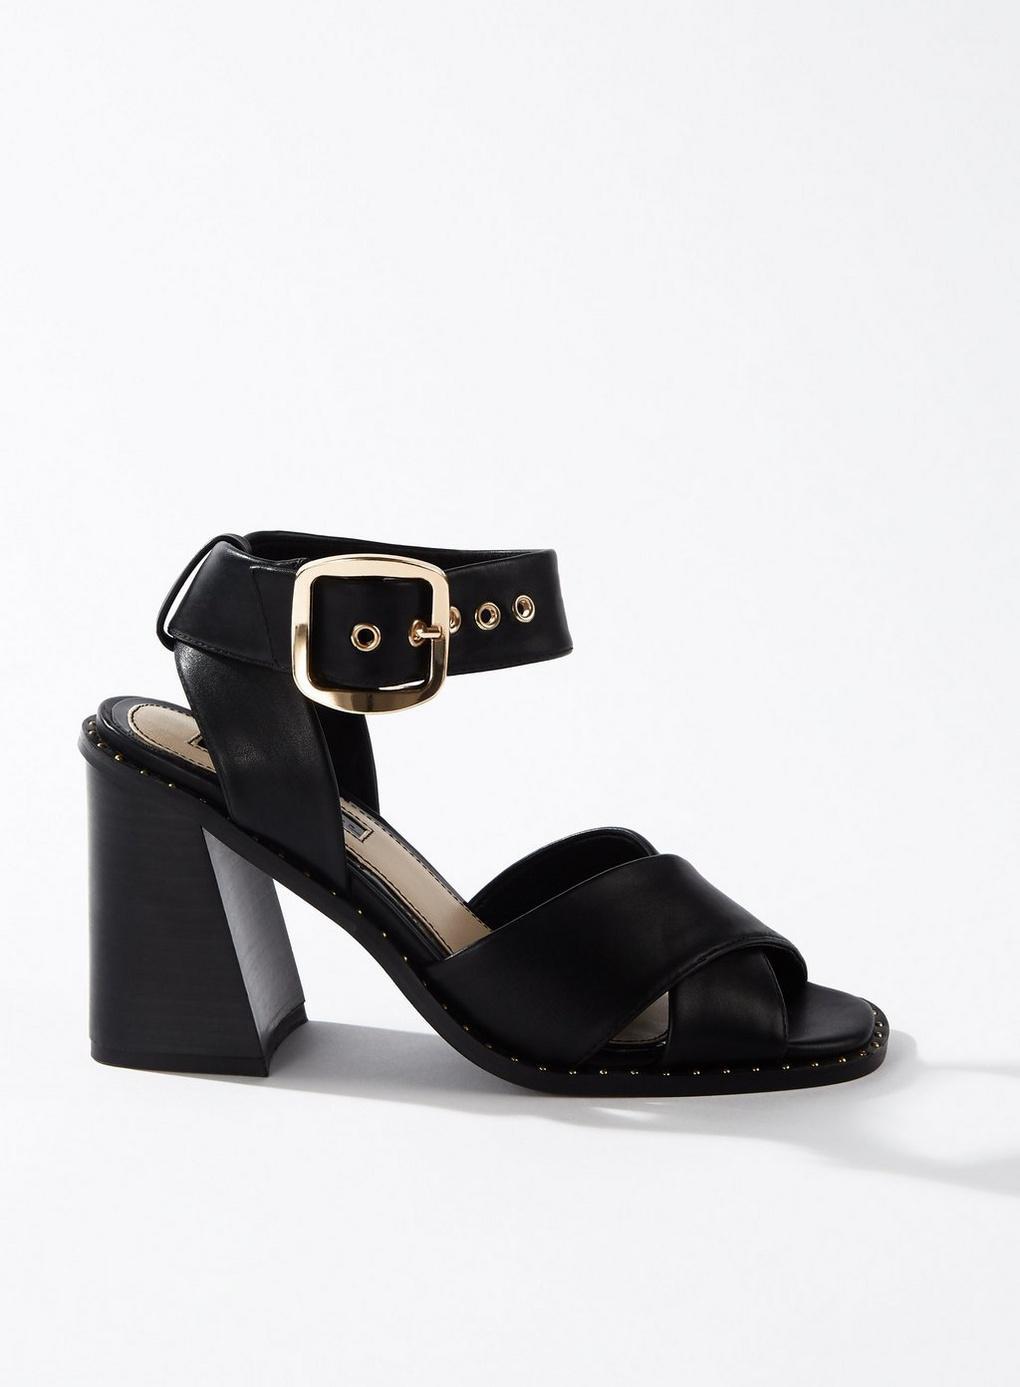 0b819b70fe4 Lyst - Miss Selfridge Saffron Black Buckle Sandals in Black